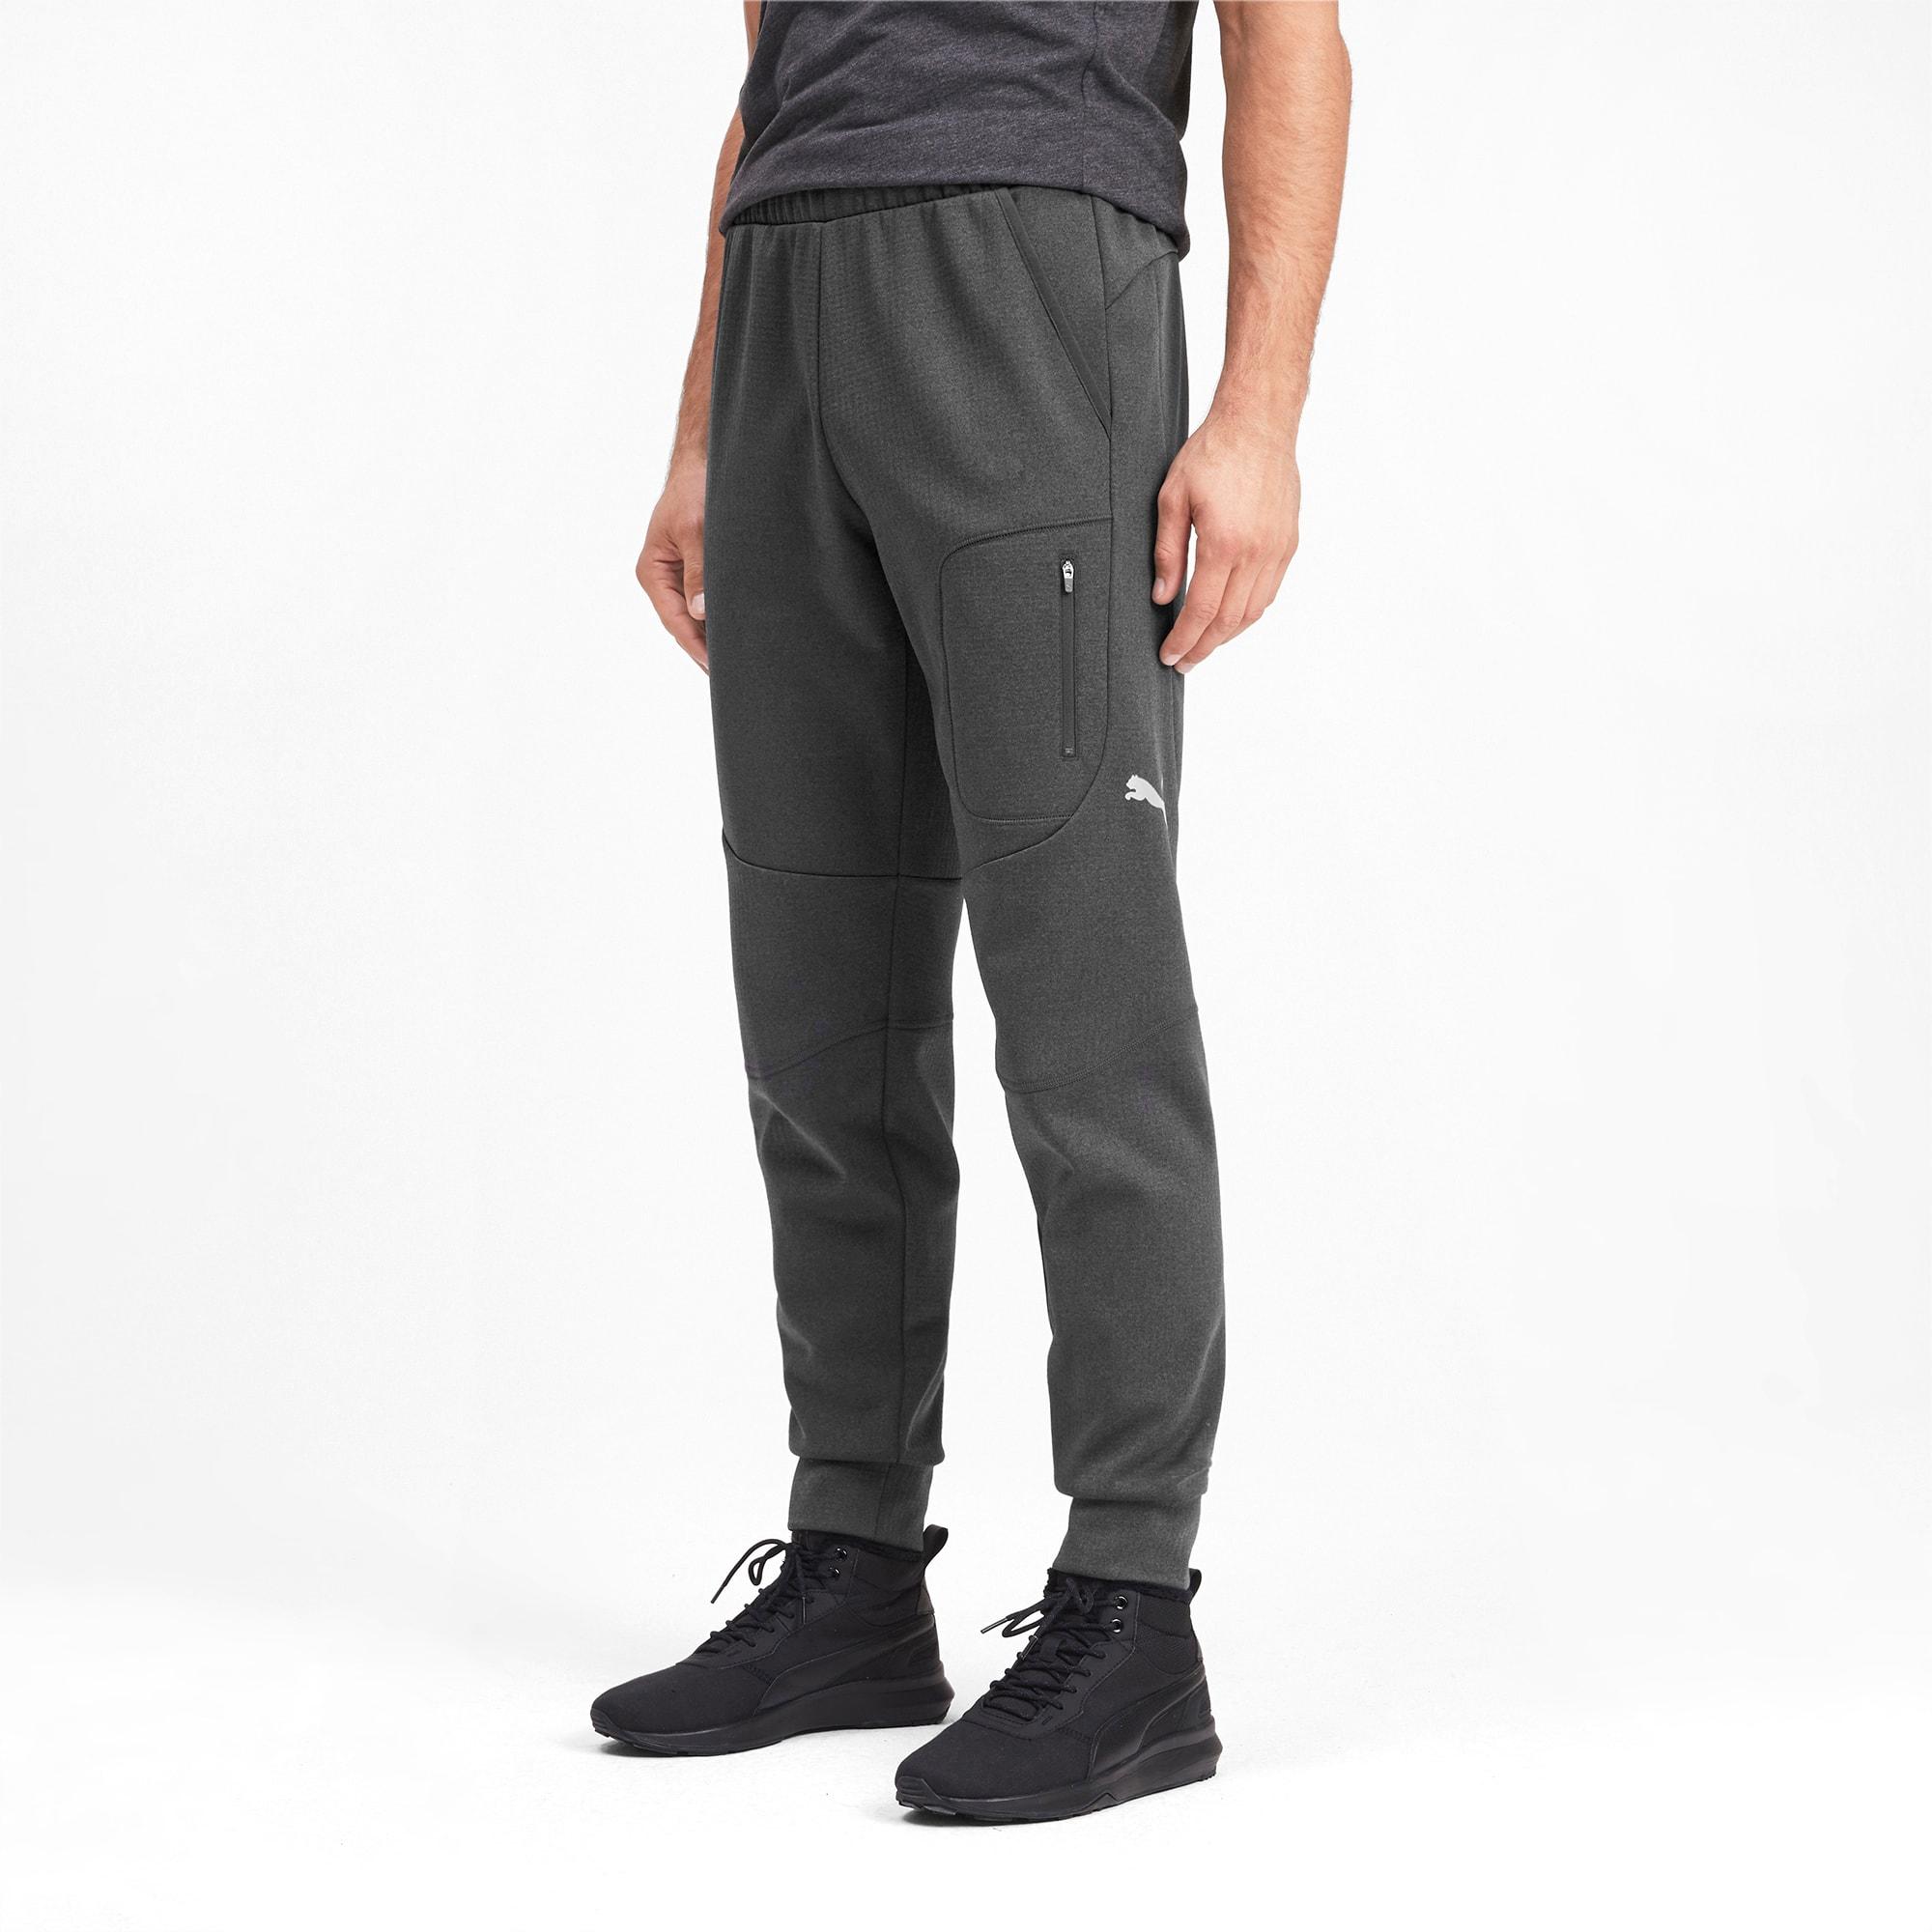 PUMA Evostripe Warm Men/'s Pants Men Knitted Pants Basics